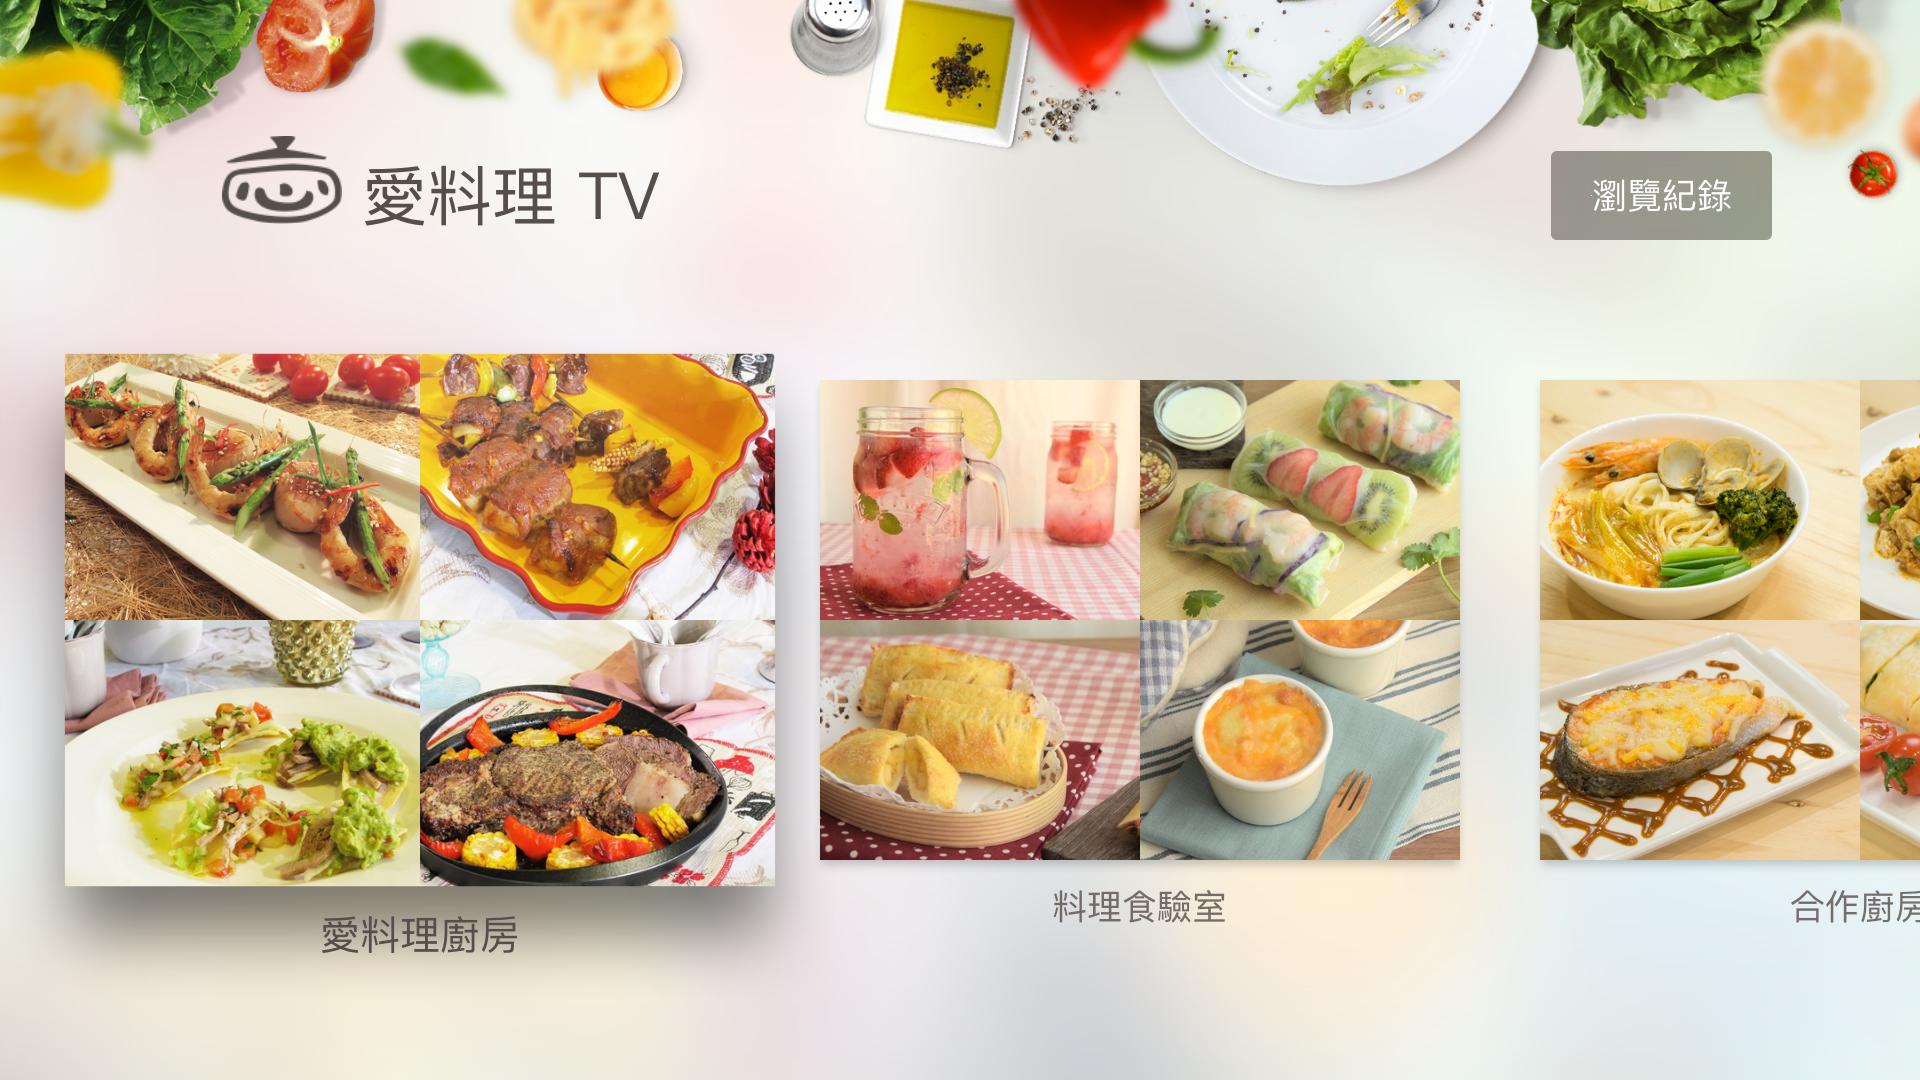 iCook TV image 1